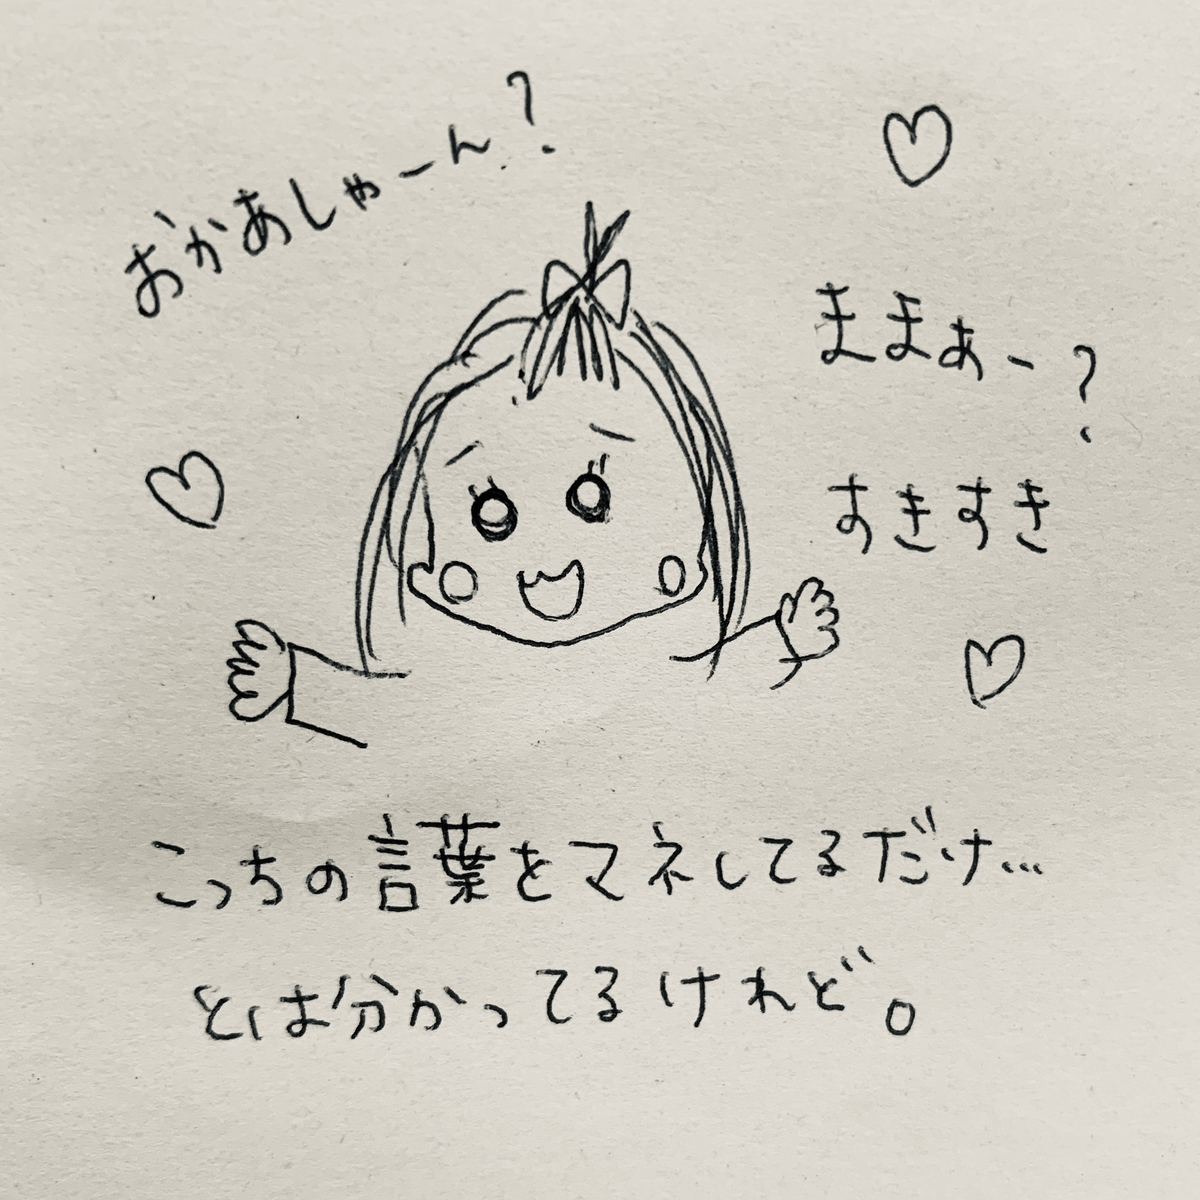 f:id:nananan0:20190425113644j:plain